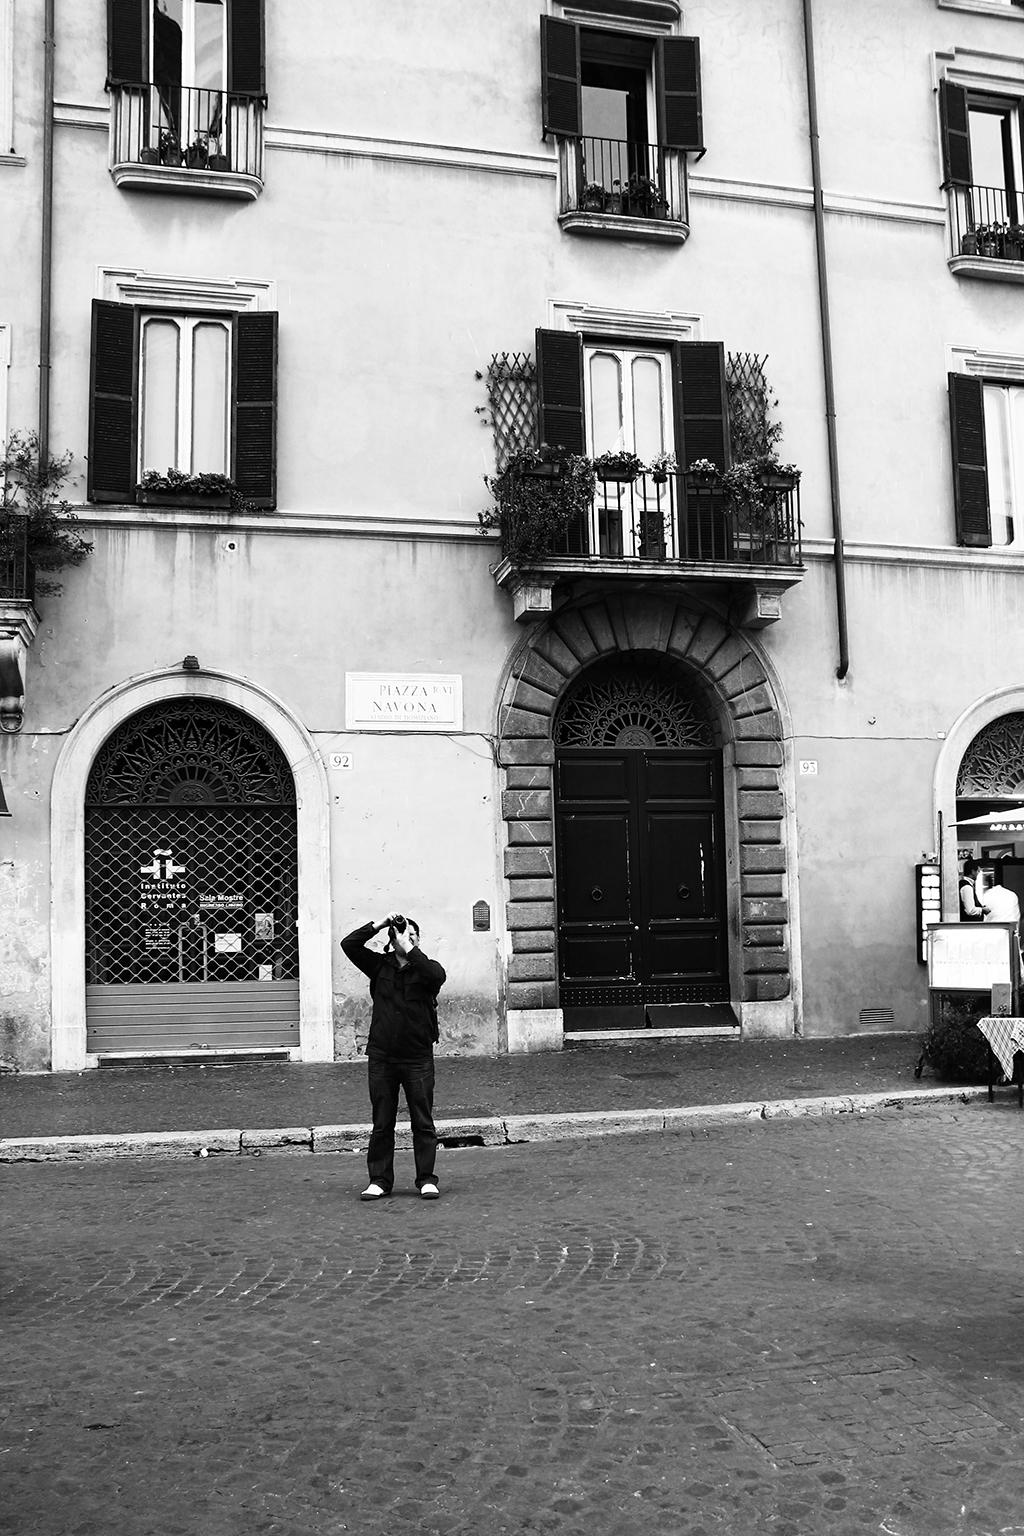 Piazza Navona, Rome - Photo Essay by Amit Khanna (2).JPG